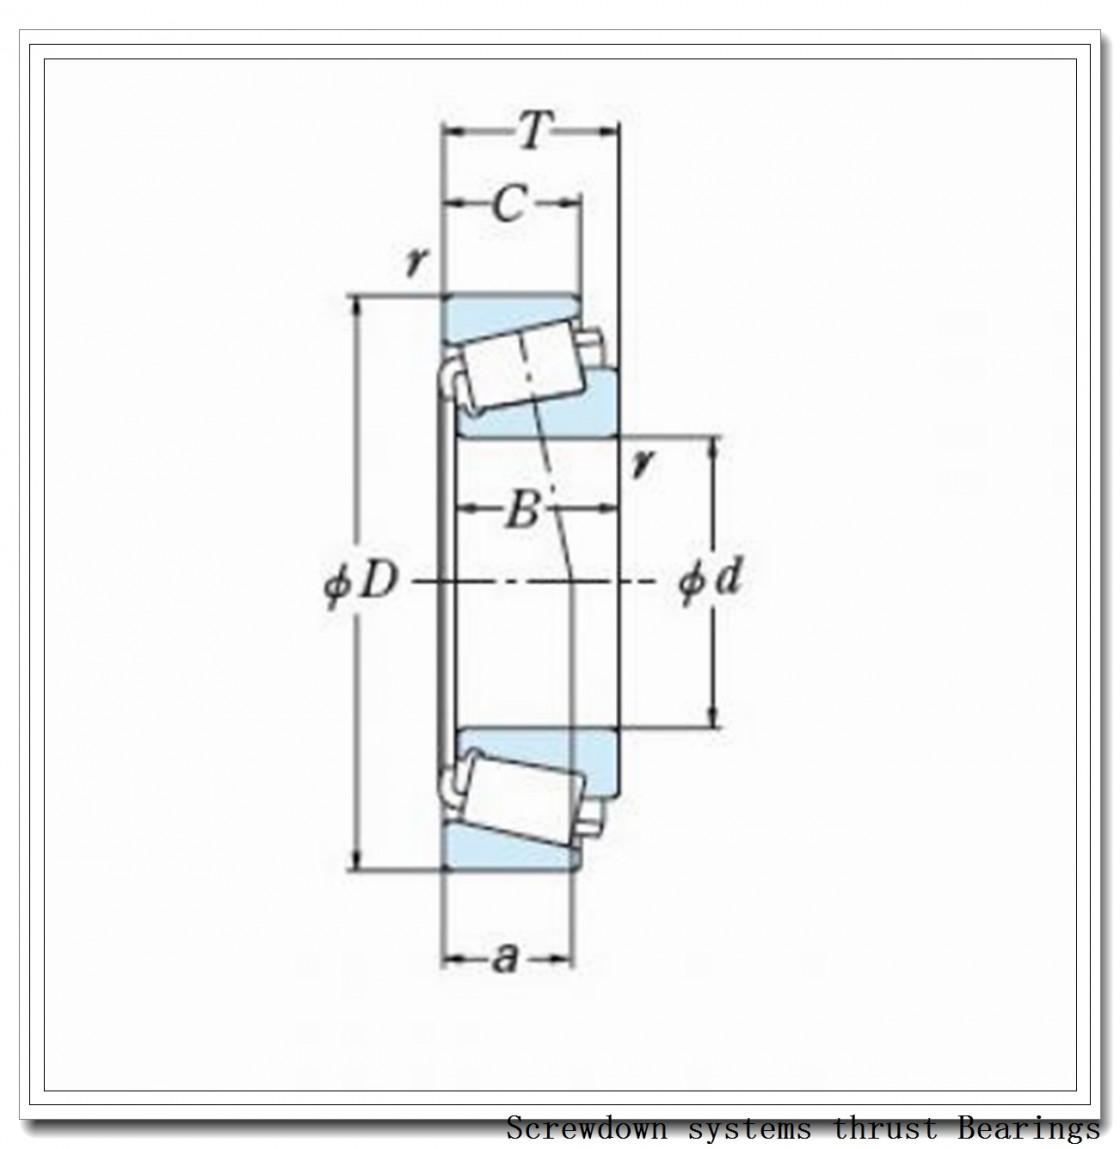 218TTsv946 screwdown systems thrust Bearings